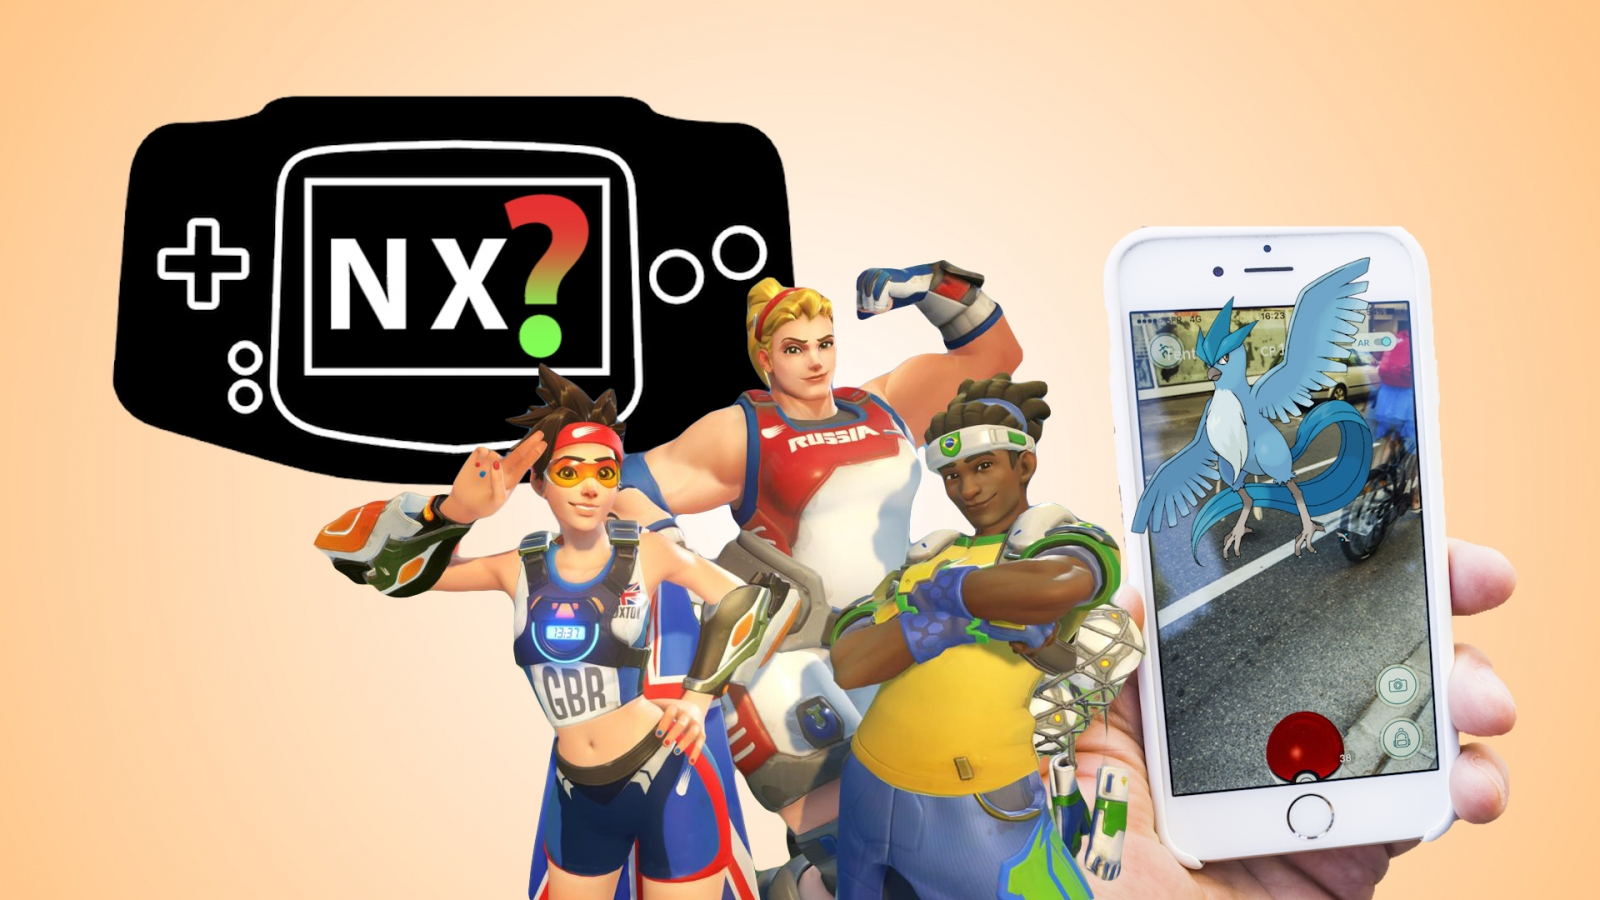 Video game news round-up: Nintendo NX, Pokemon Go and Overwatch